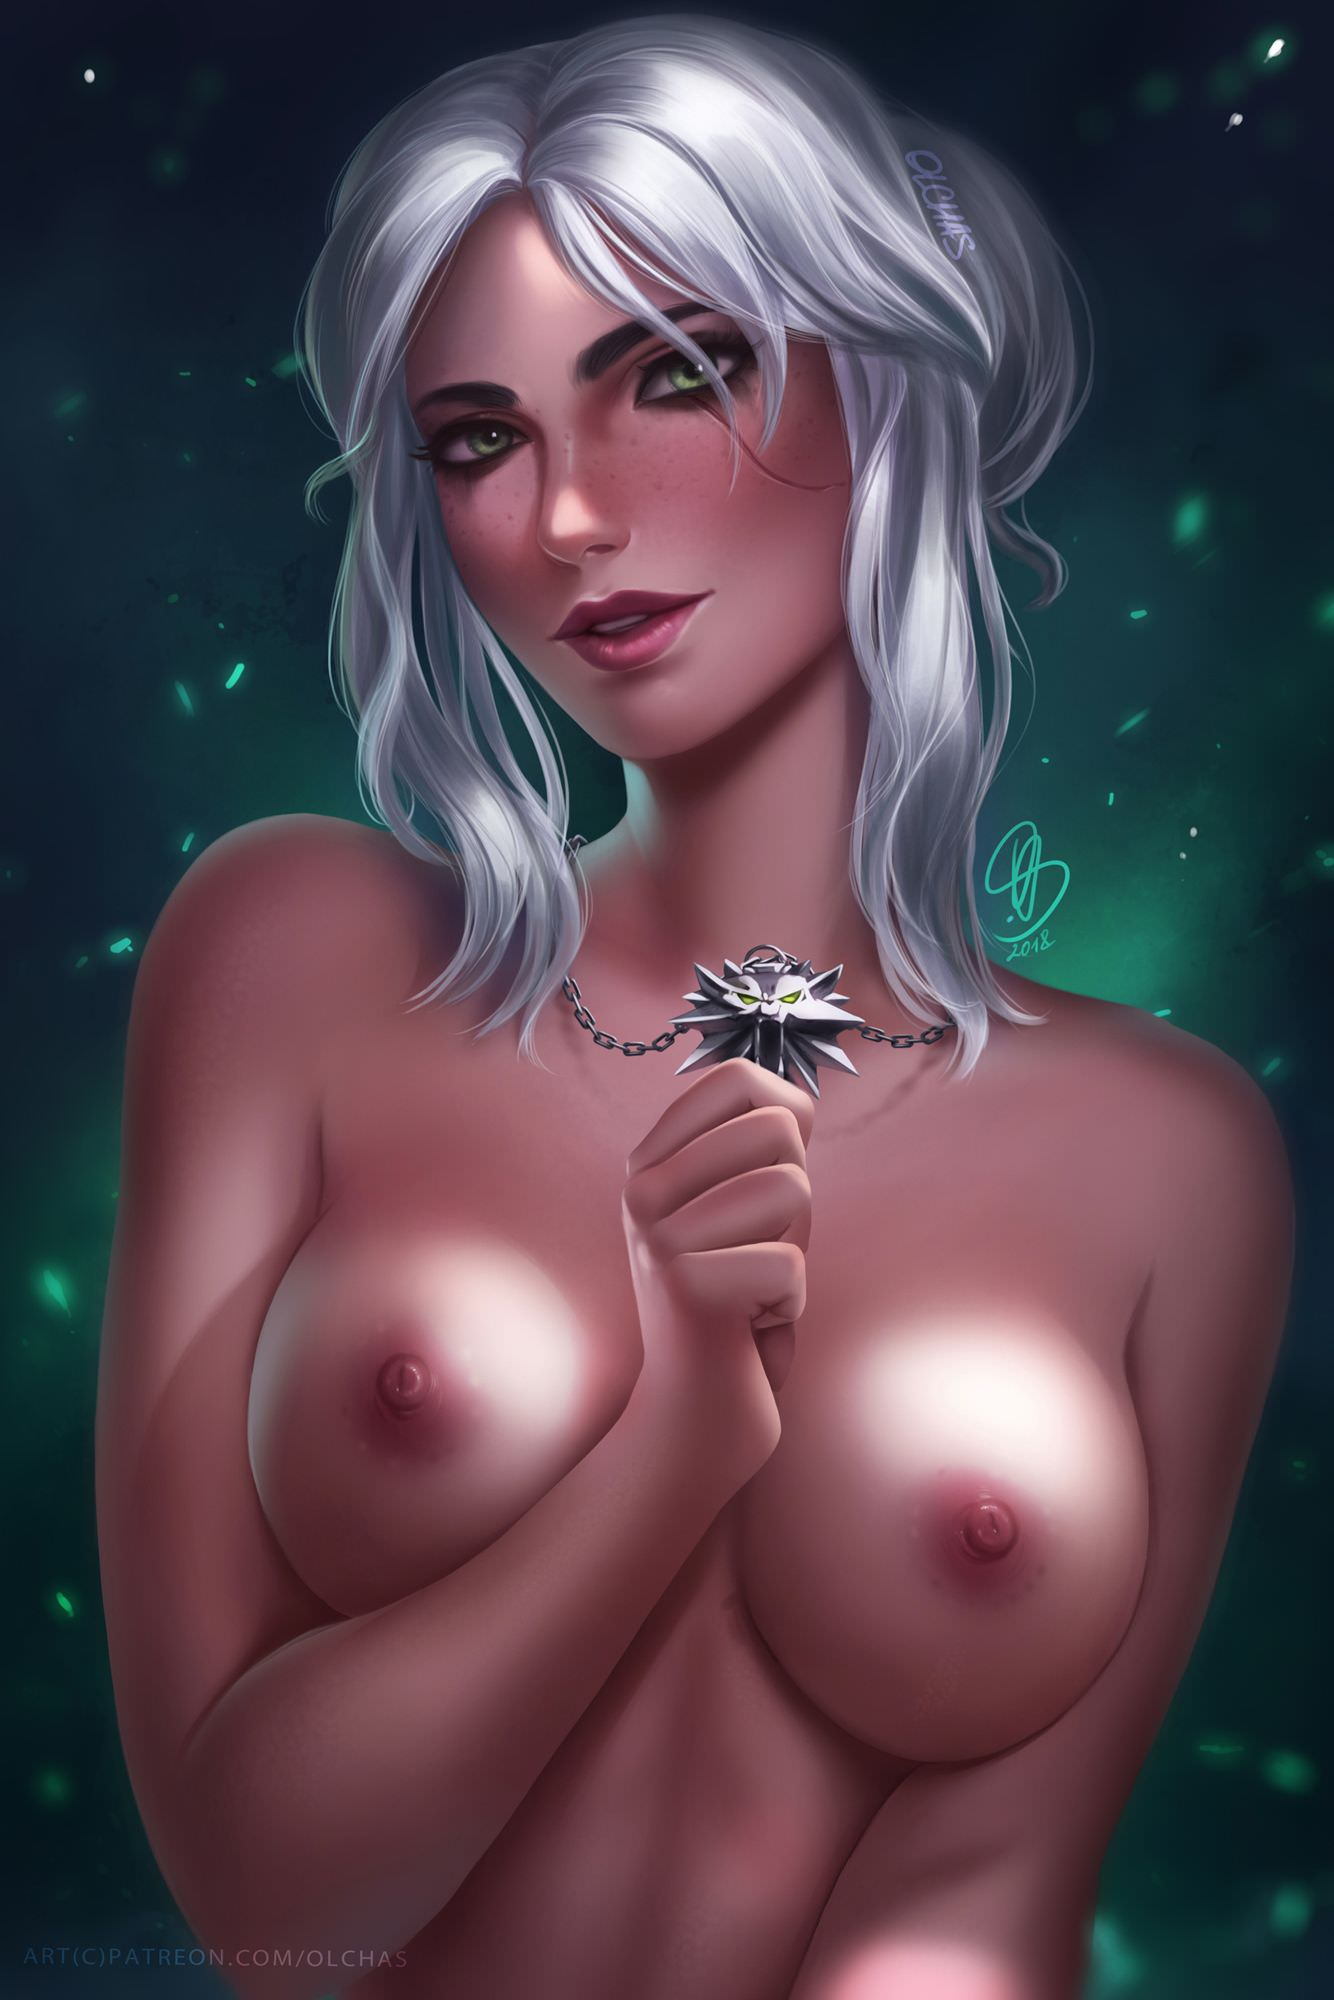 Nude ciri Witcher Cosplay